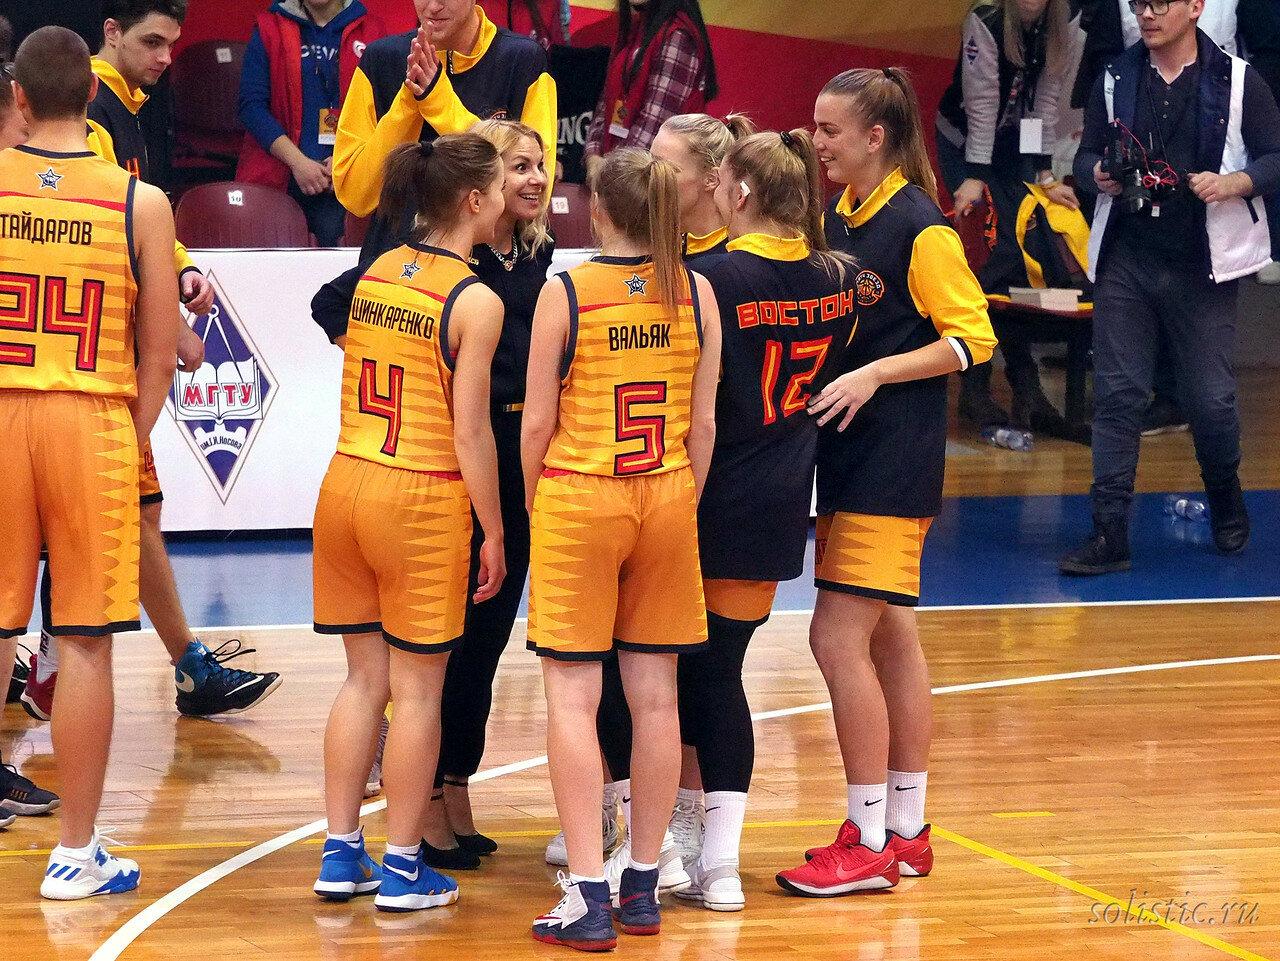 150 Матч звезд АСБ 2018 (ассоциации студенческого баскетбола)